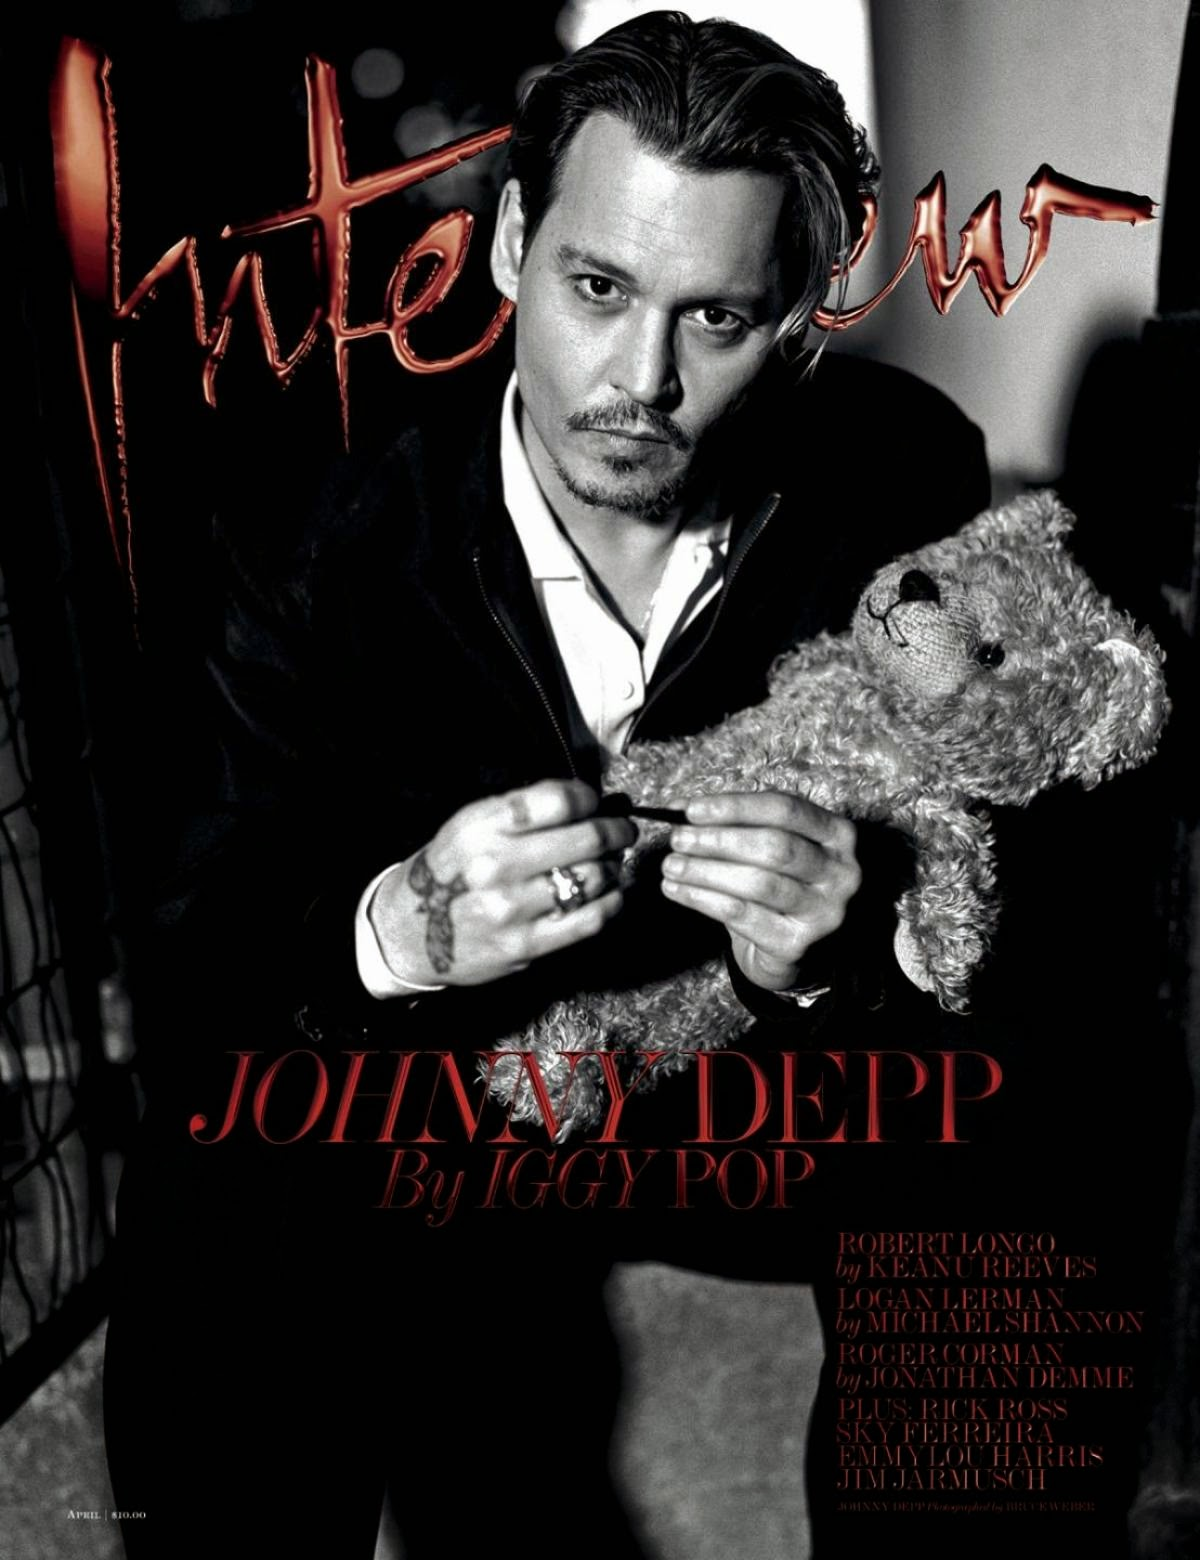 Johnny Depp by Bruce Weber